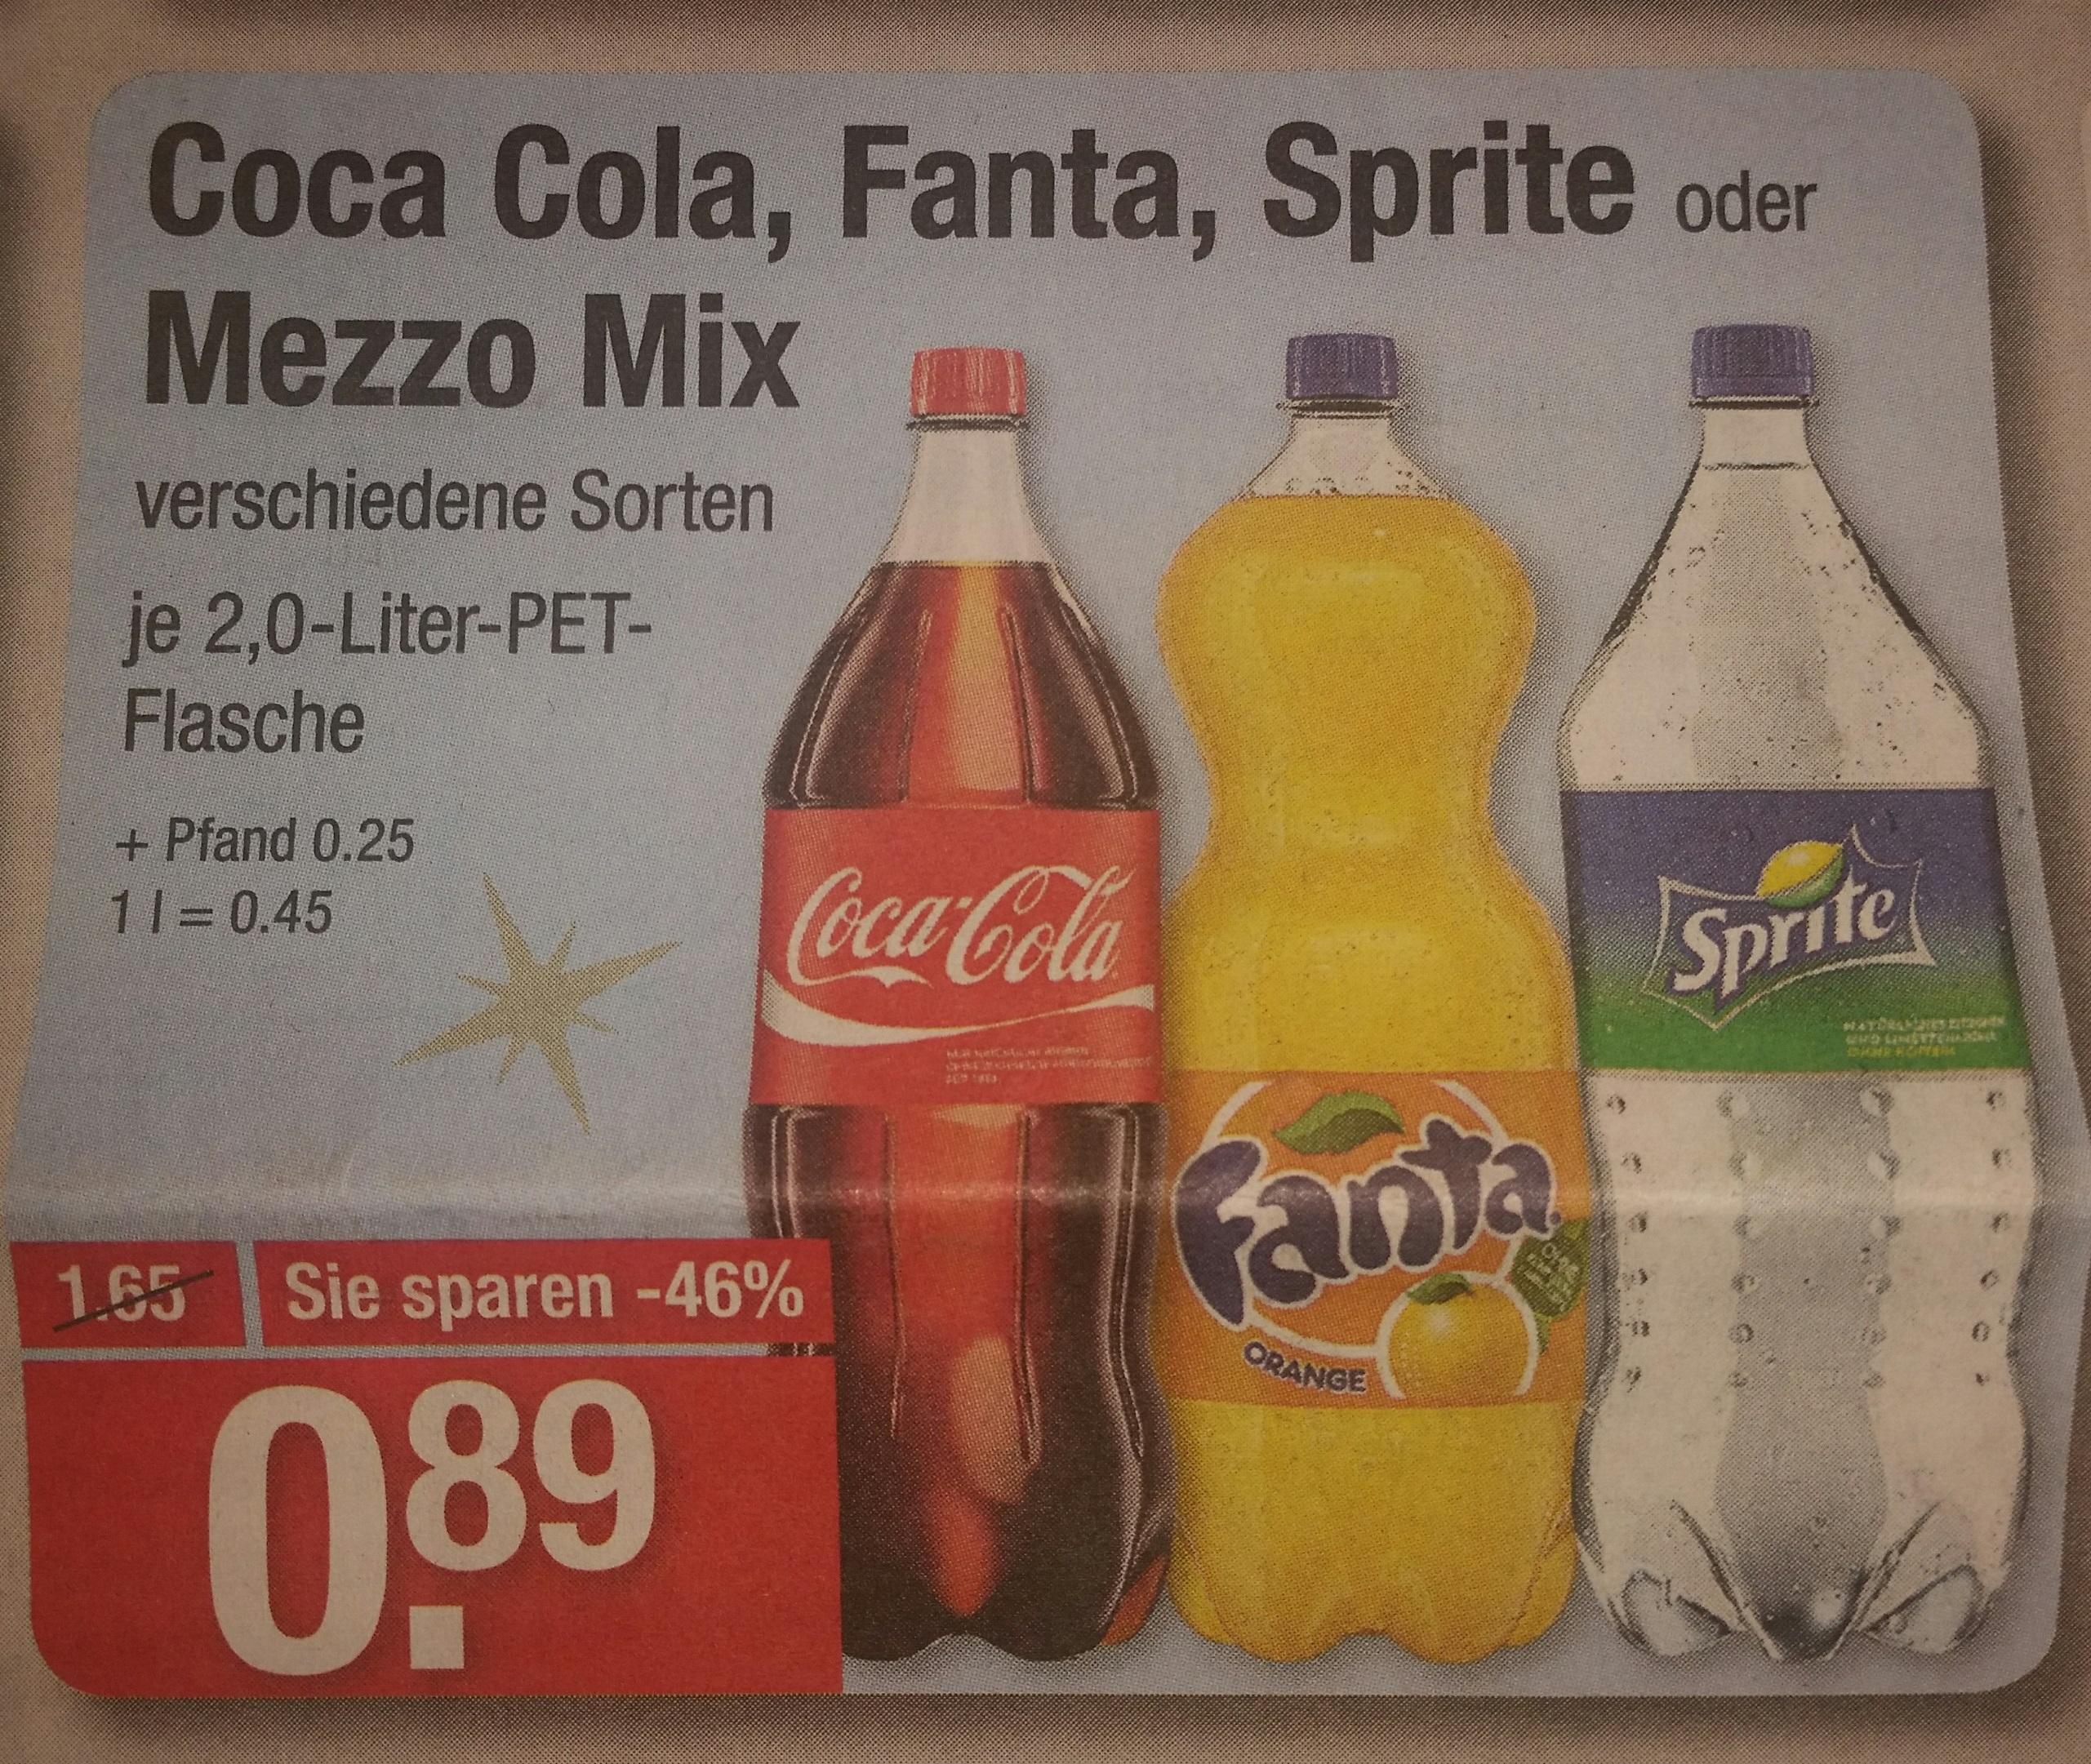 [V-Markt] Coca Cola 0,45€ / Liter